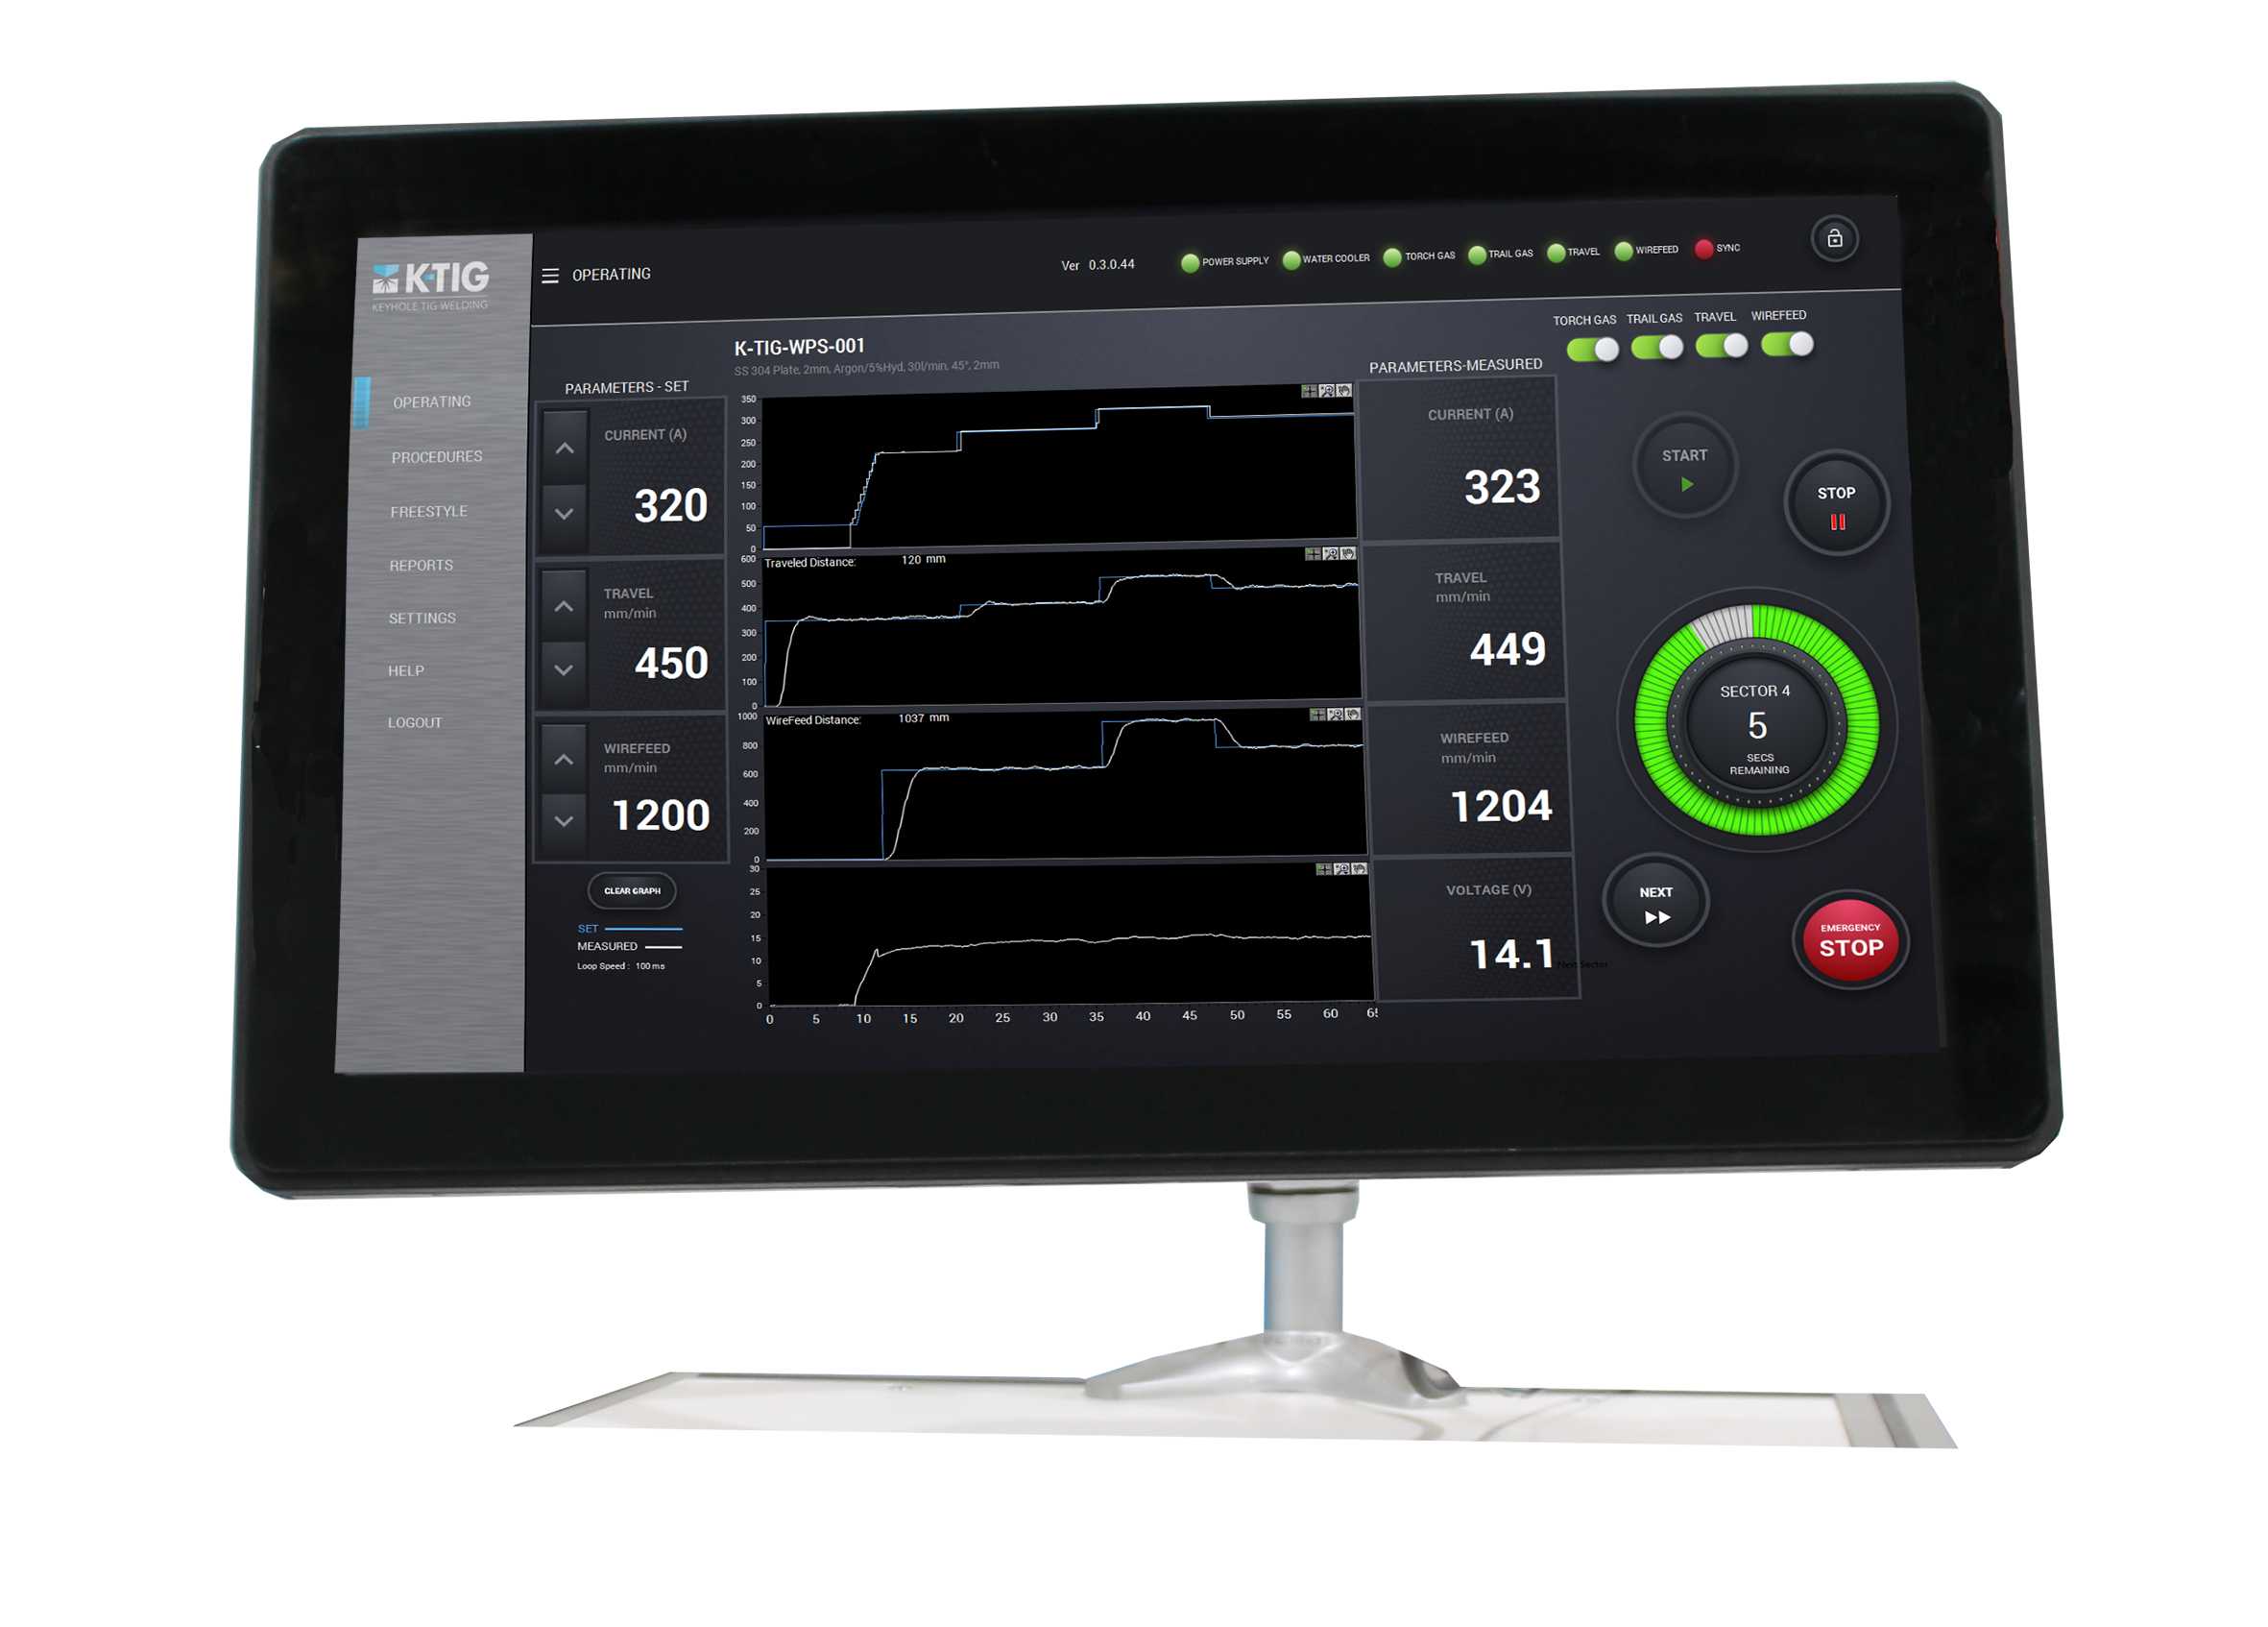 K-TIG Controller Evolve 1000 Equipment-1